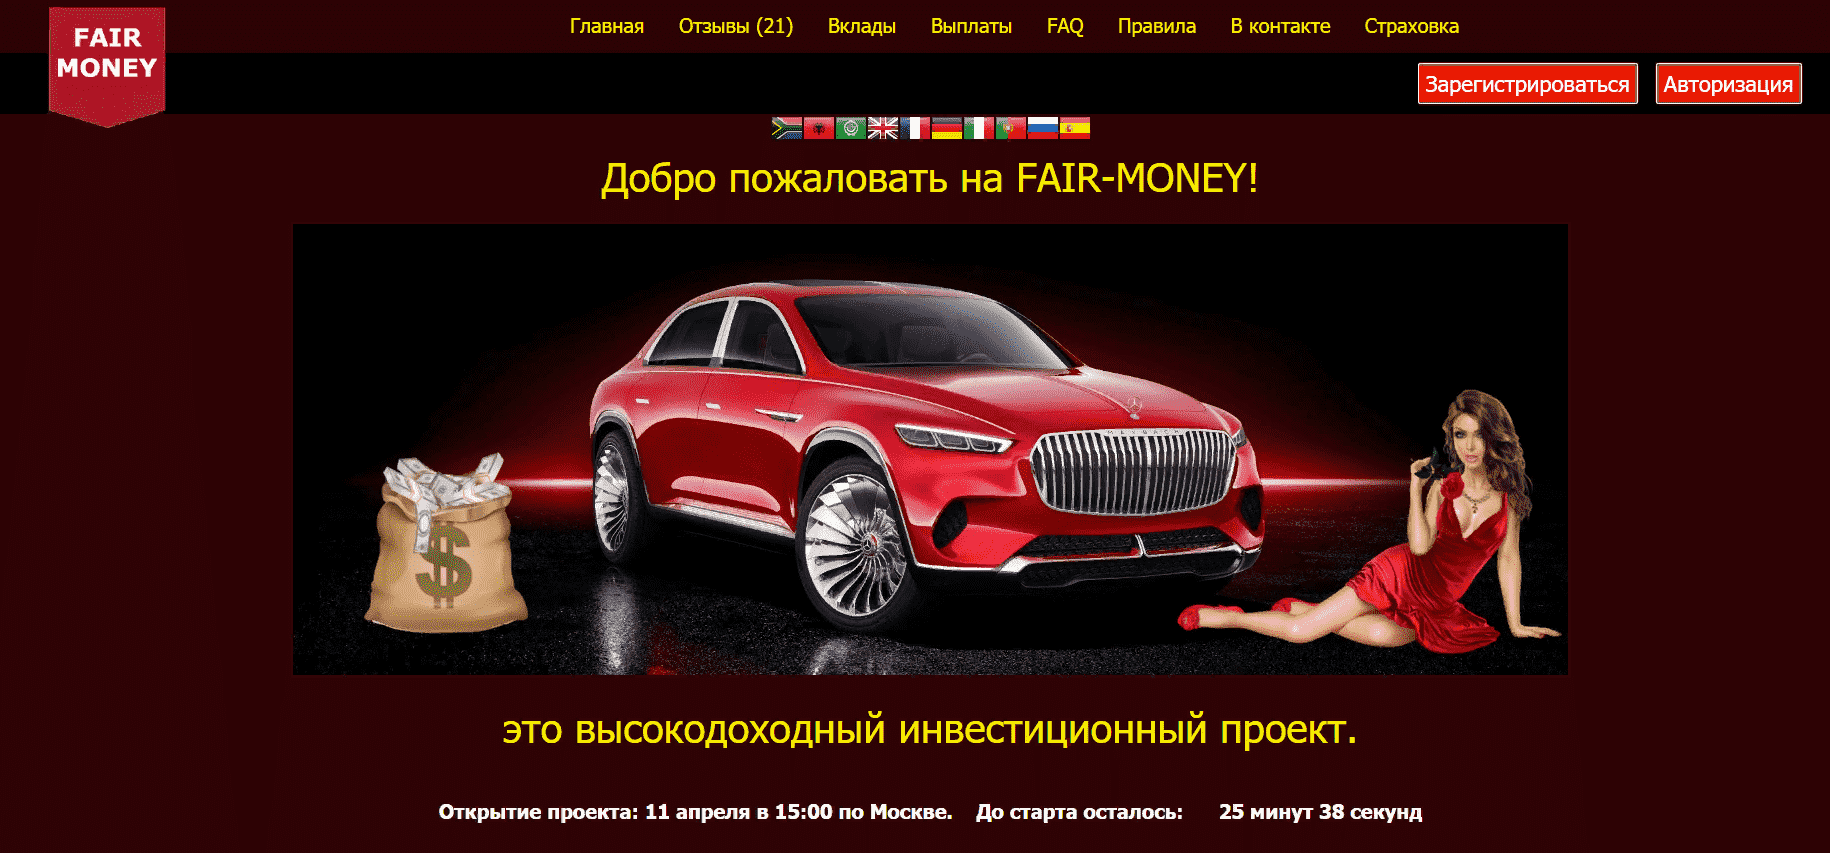 FAIR-MONEY